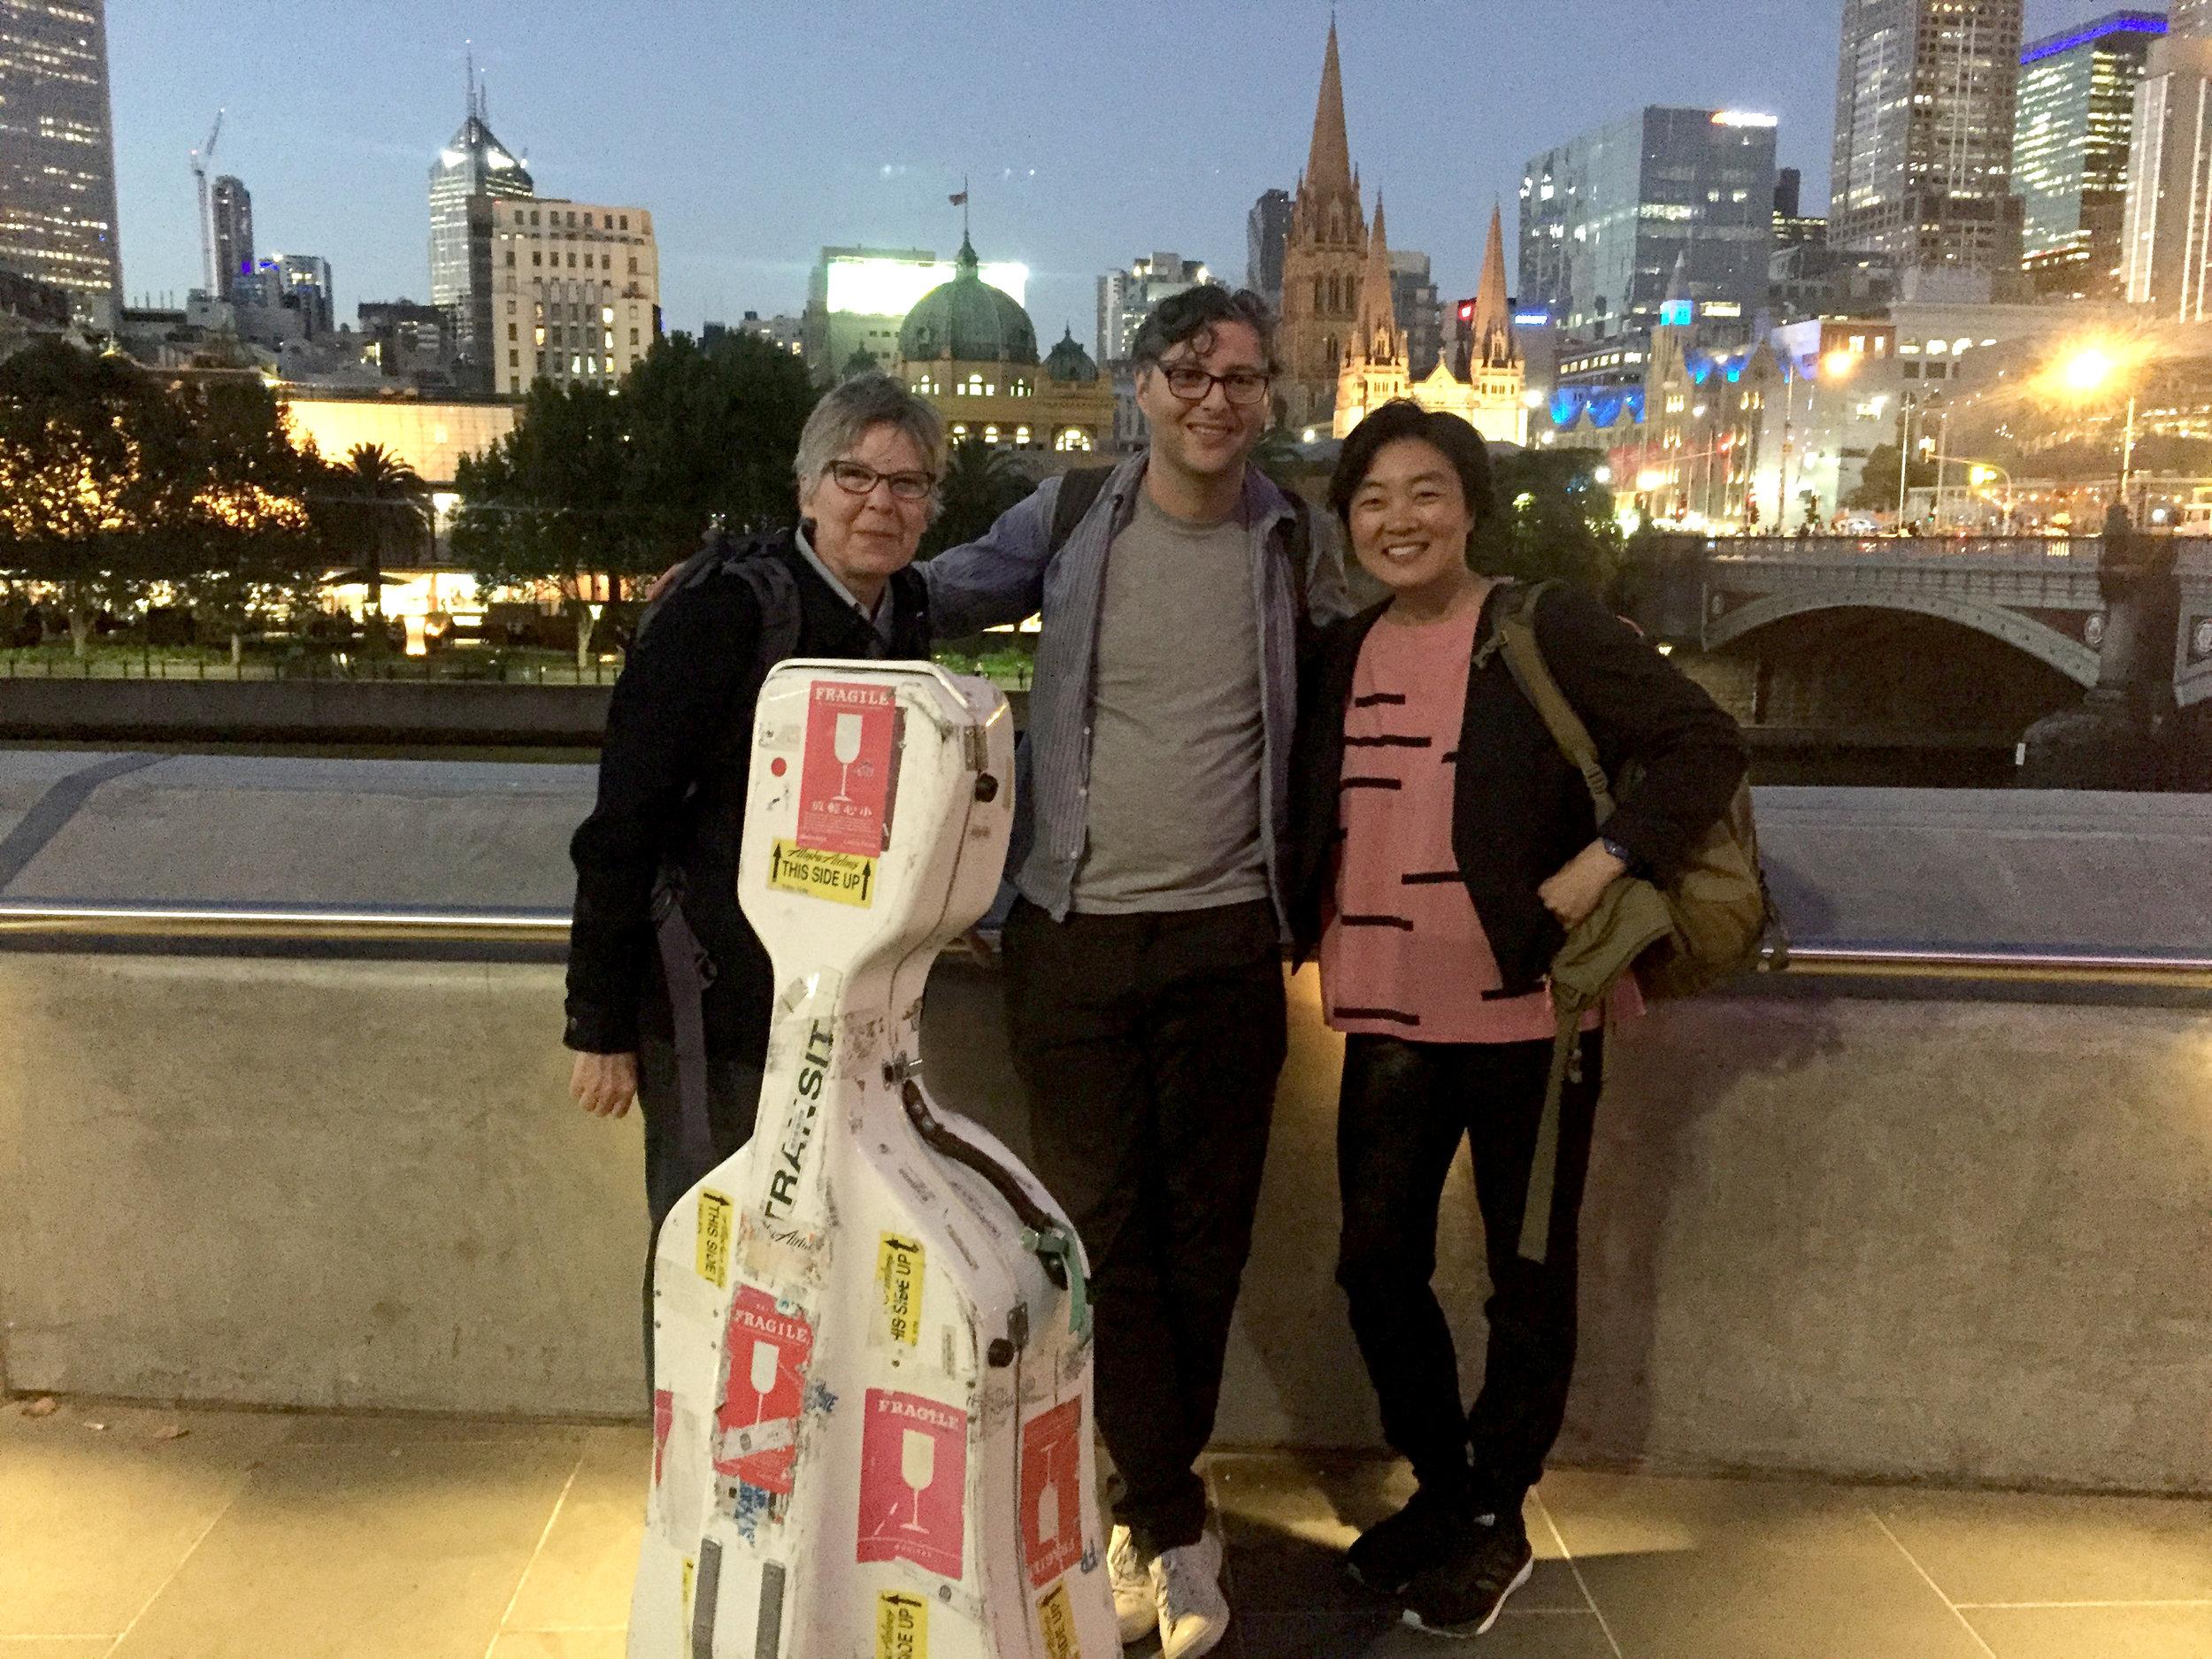 With Ellen Fullman and Joel Stern